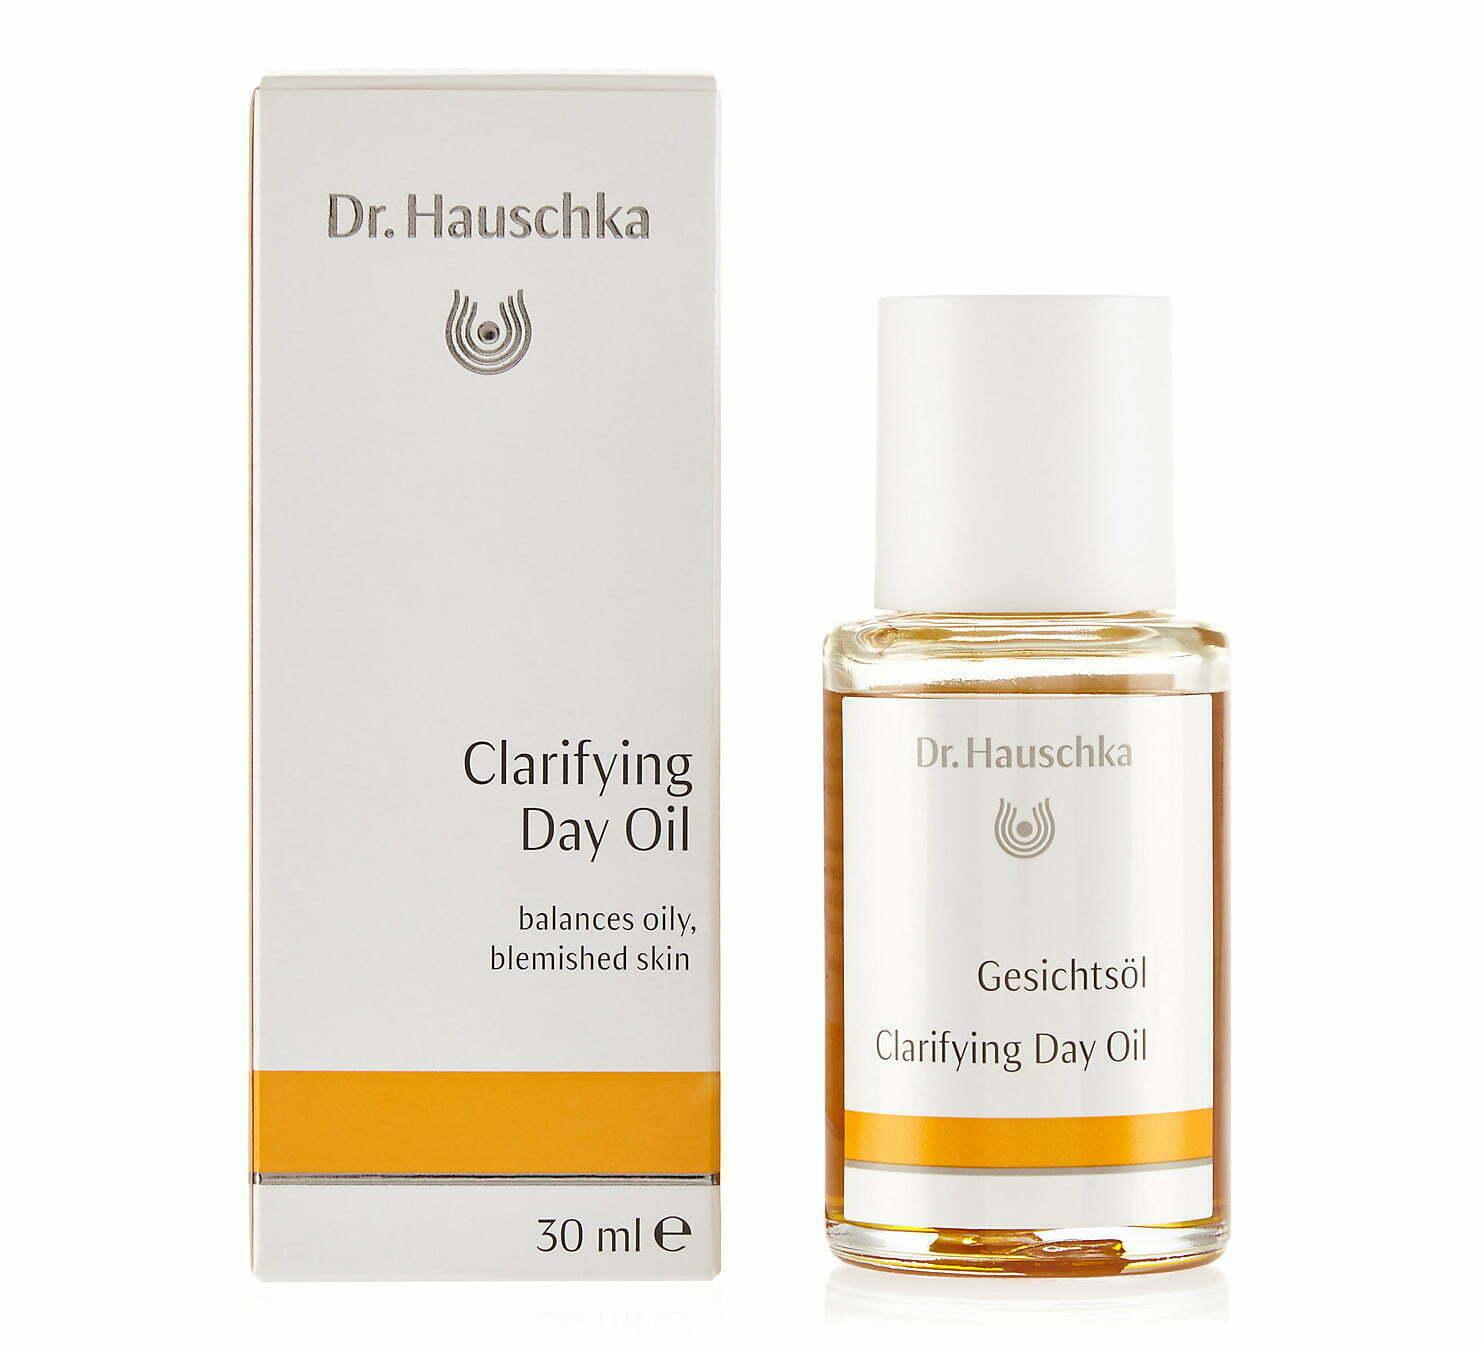 Dr Hauschka Clarifying Day Oil